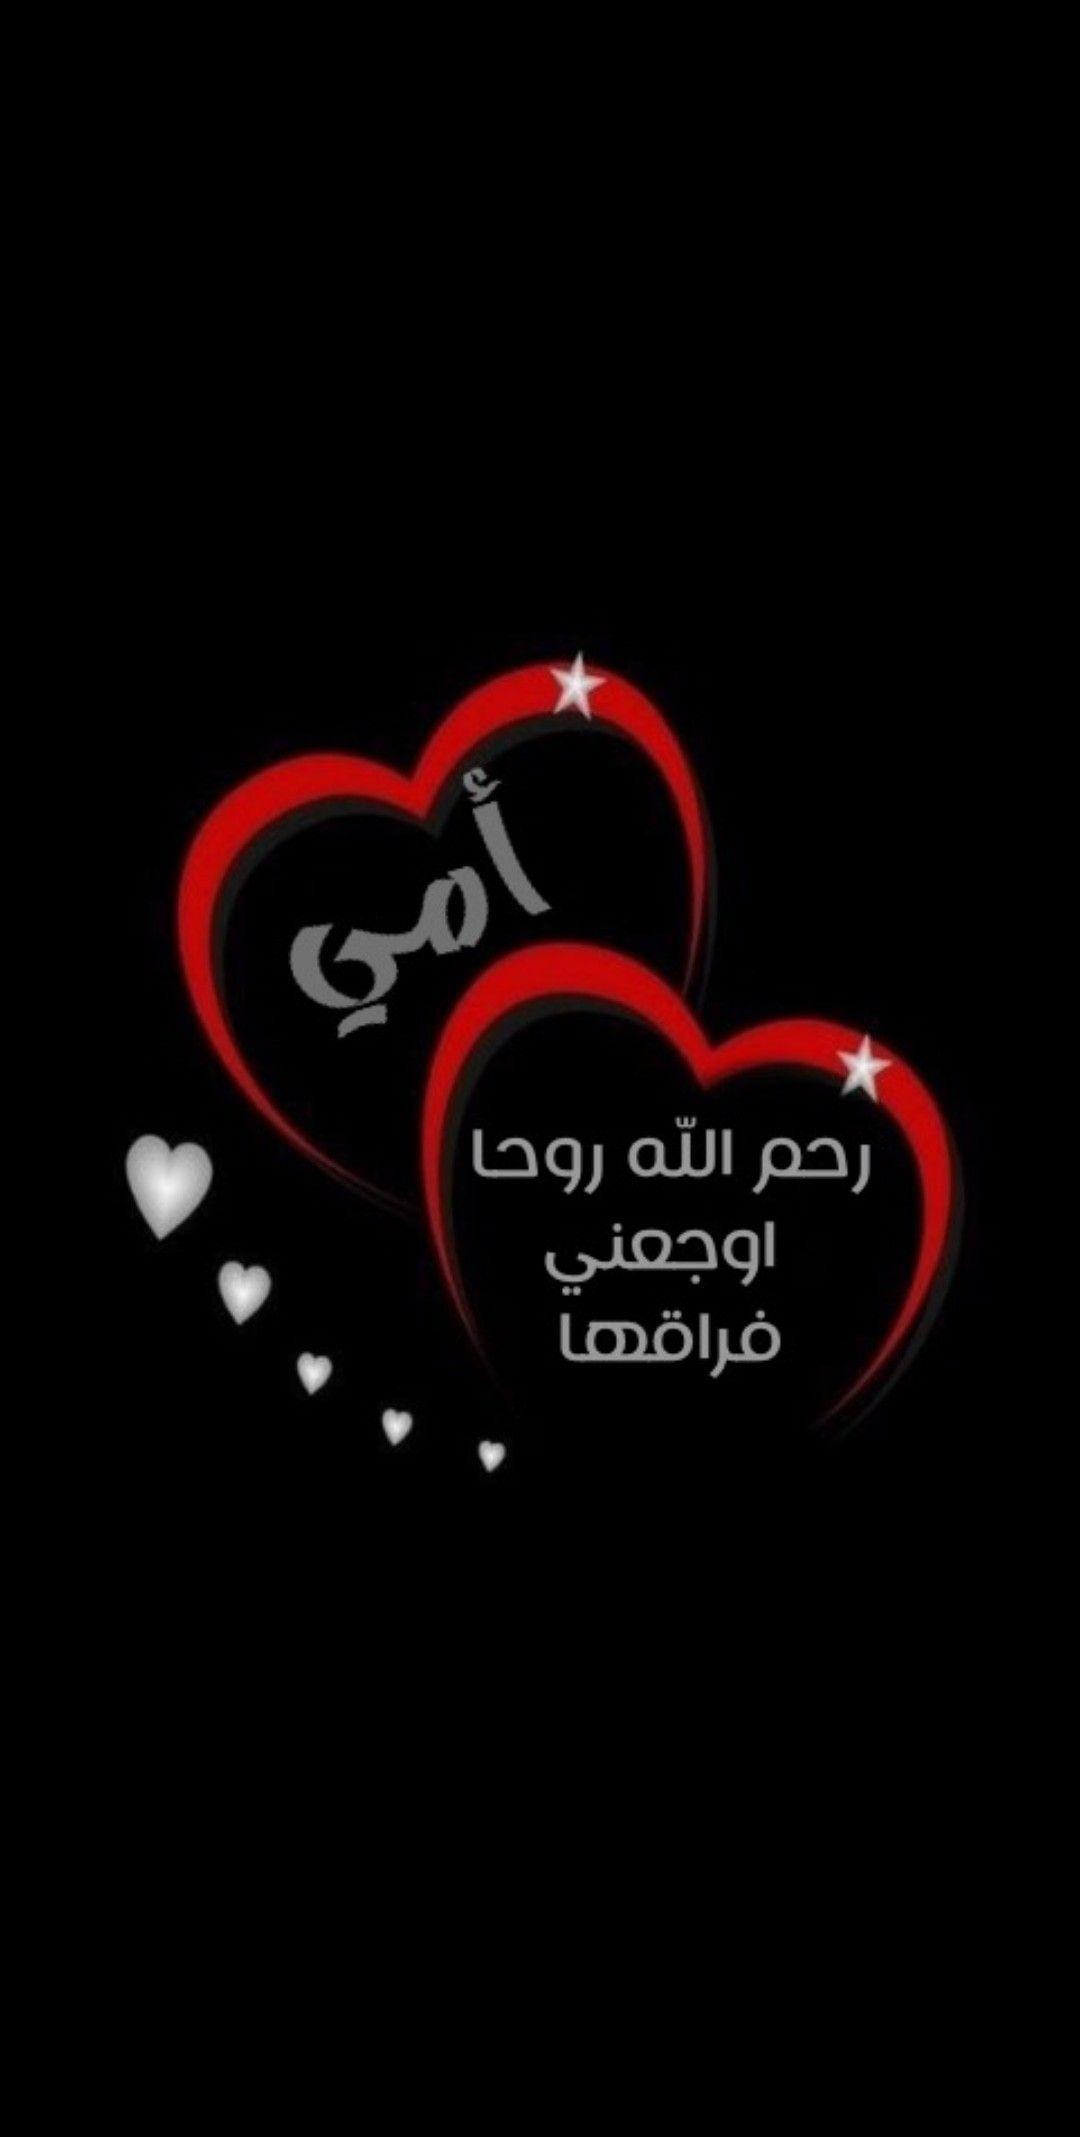 رحمك الله يا امي Arabic Tattoo Mom Day Mother Quotes